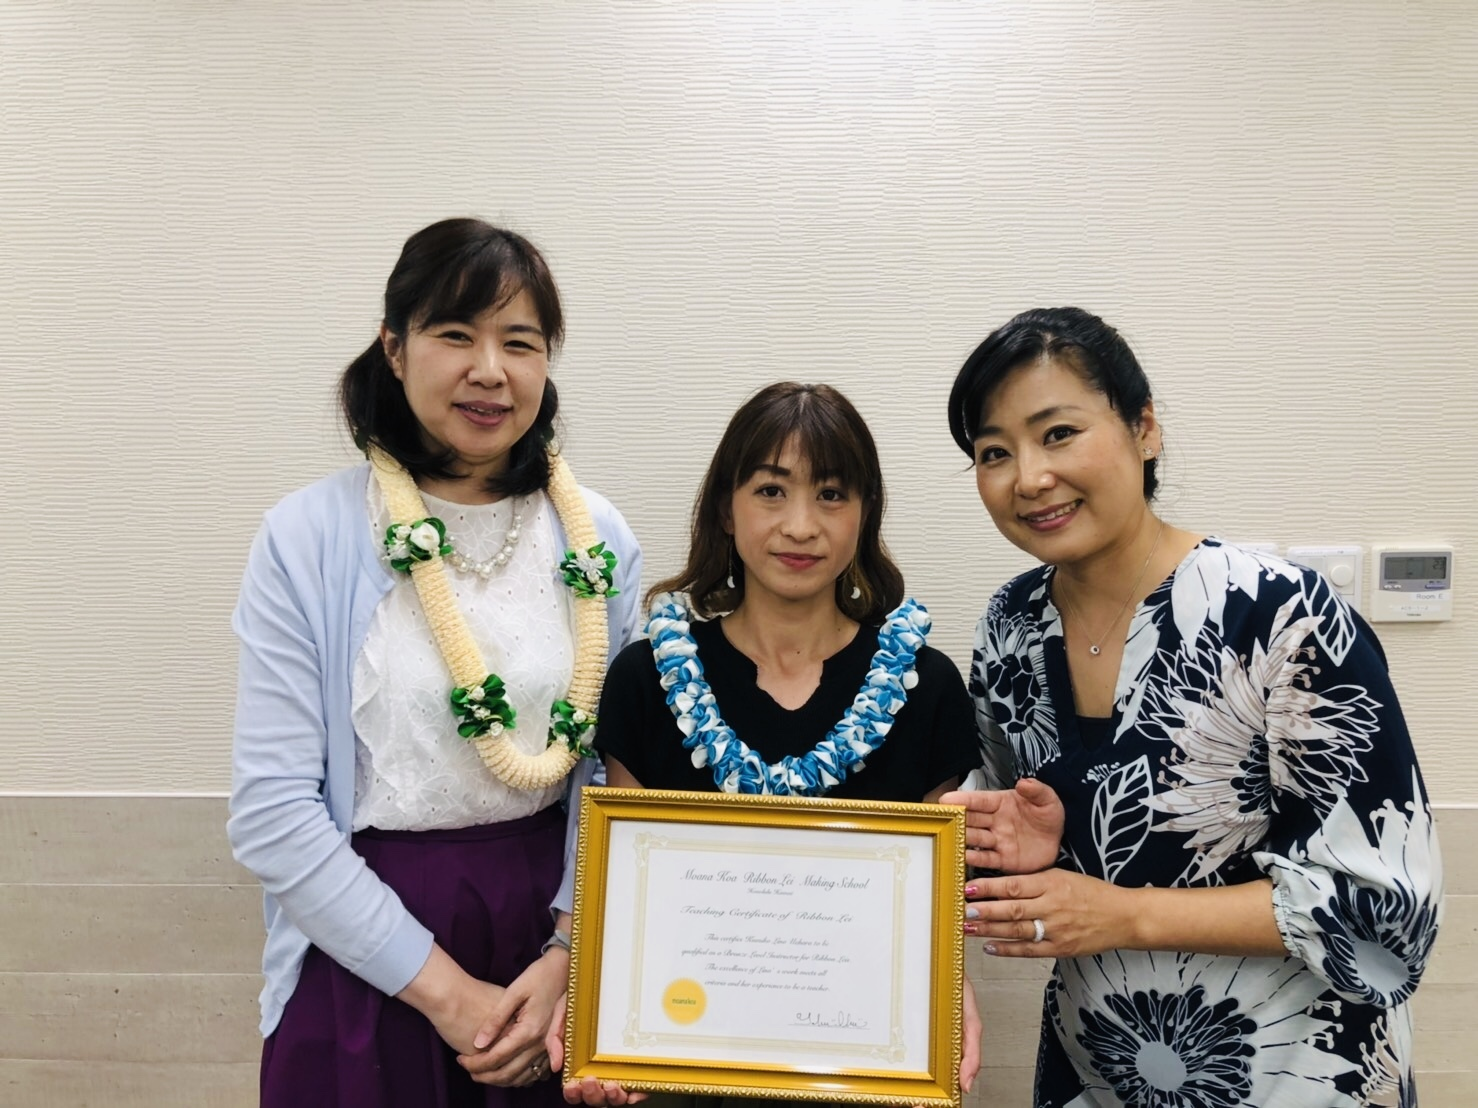 Kumikoさんがサティフィケートを 取得されました!_c0196240_16111666.jpeg